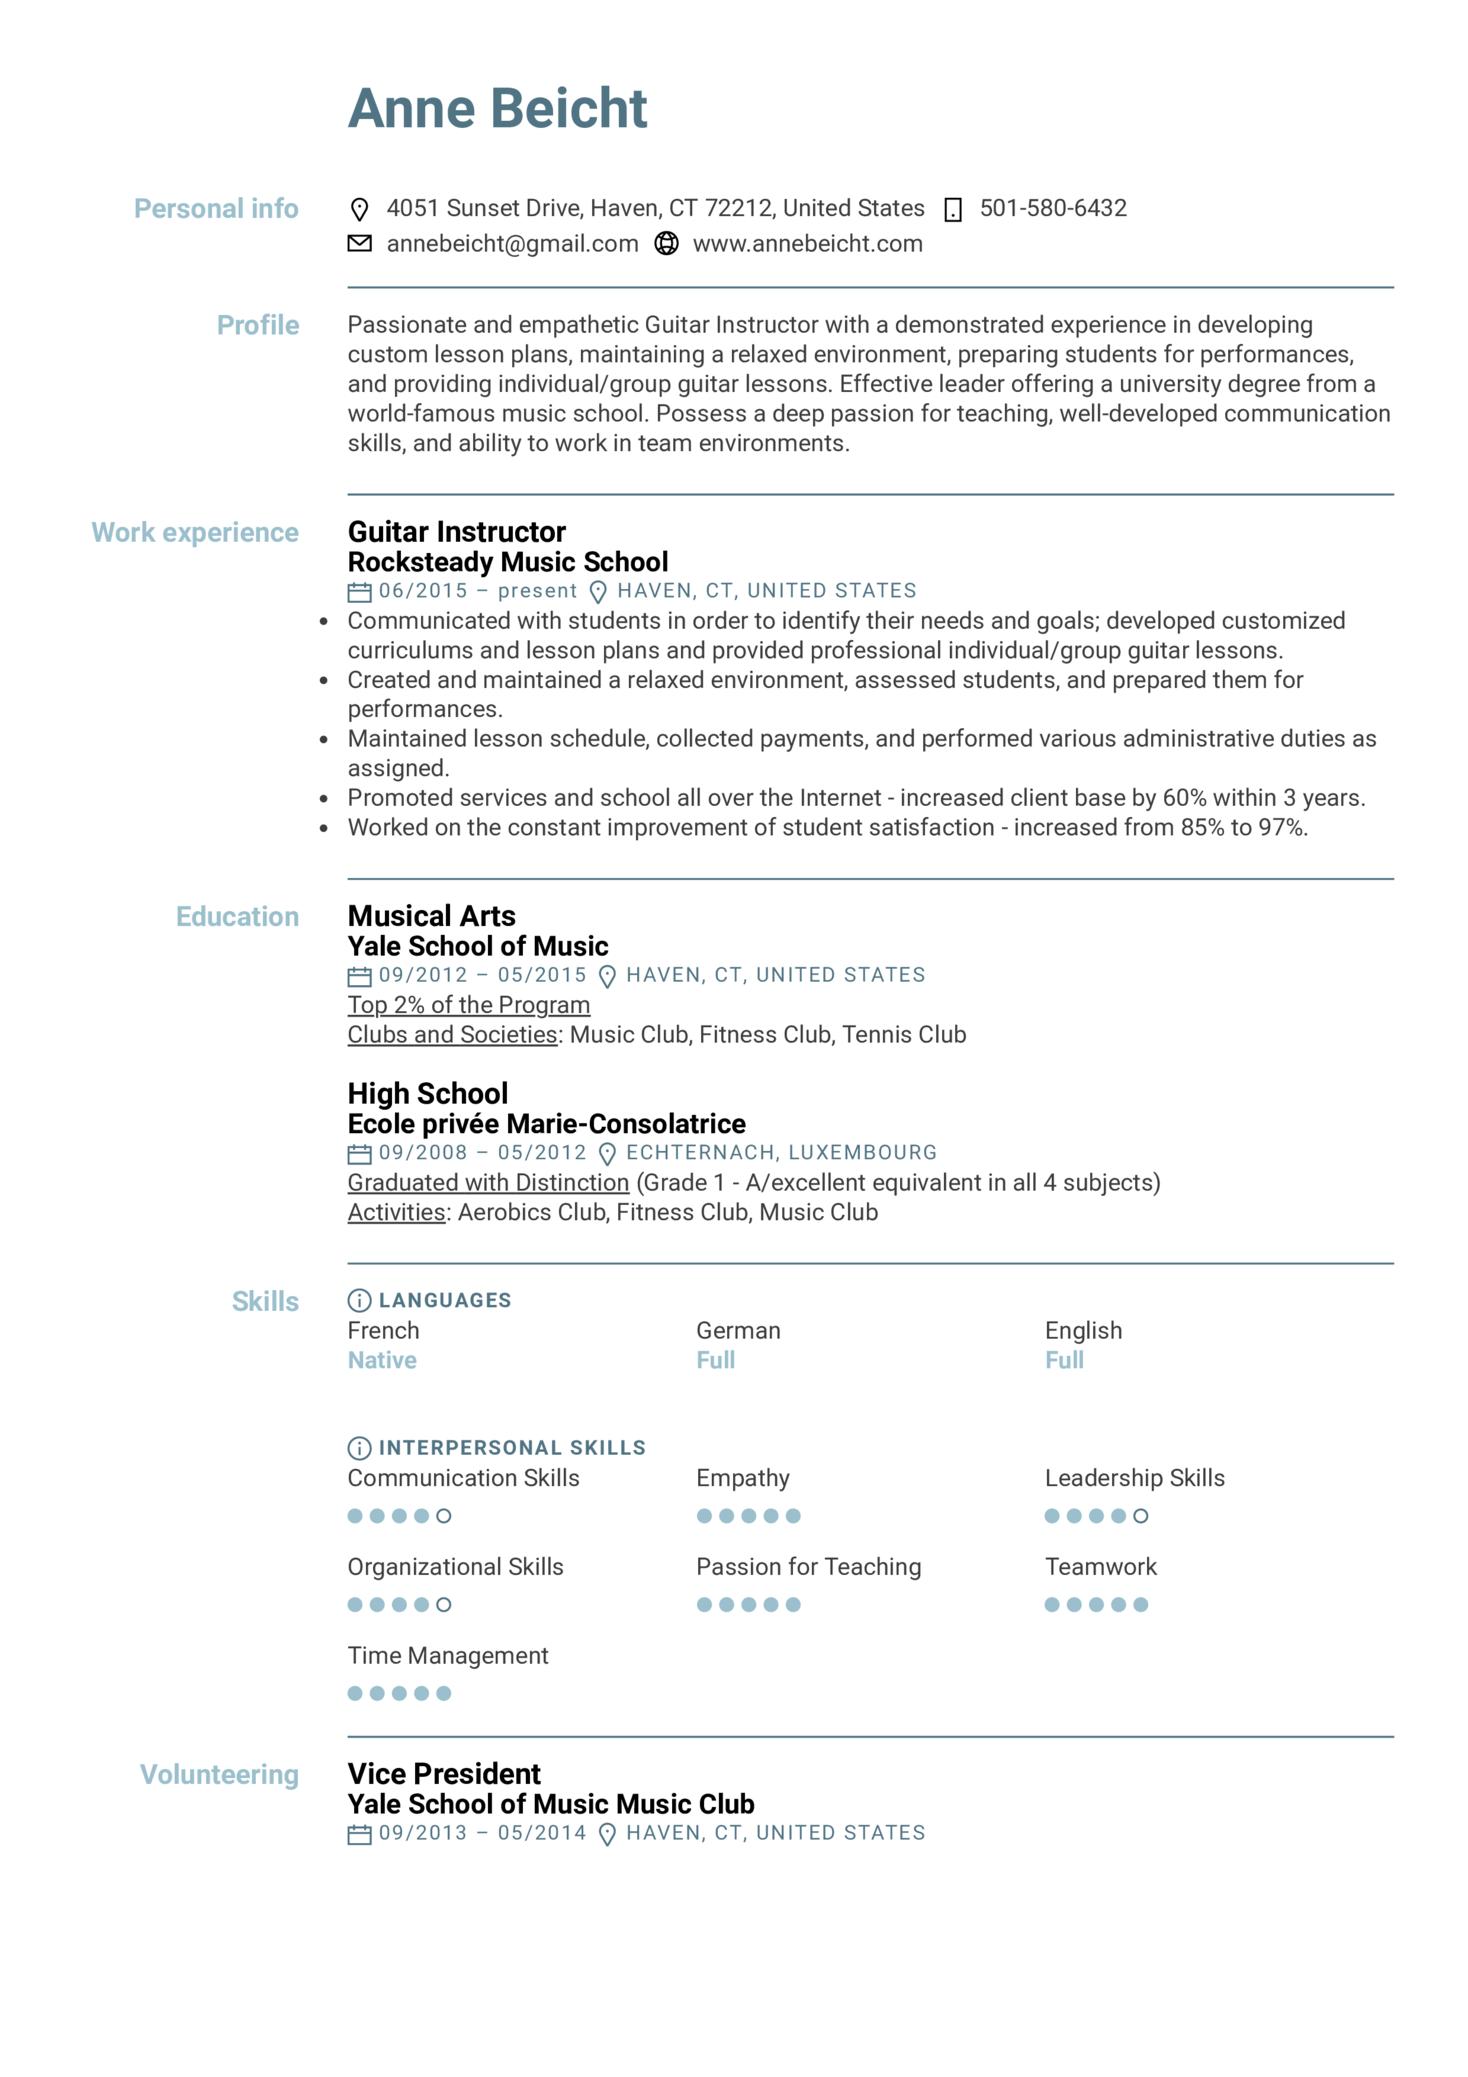 Guitar Instructor Resume Example (časť 1)